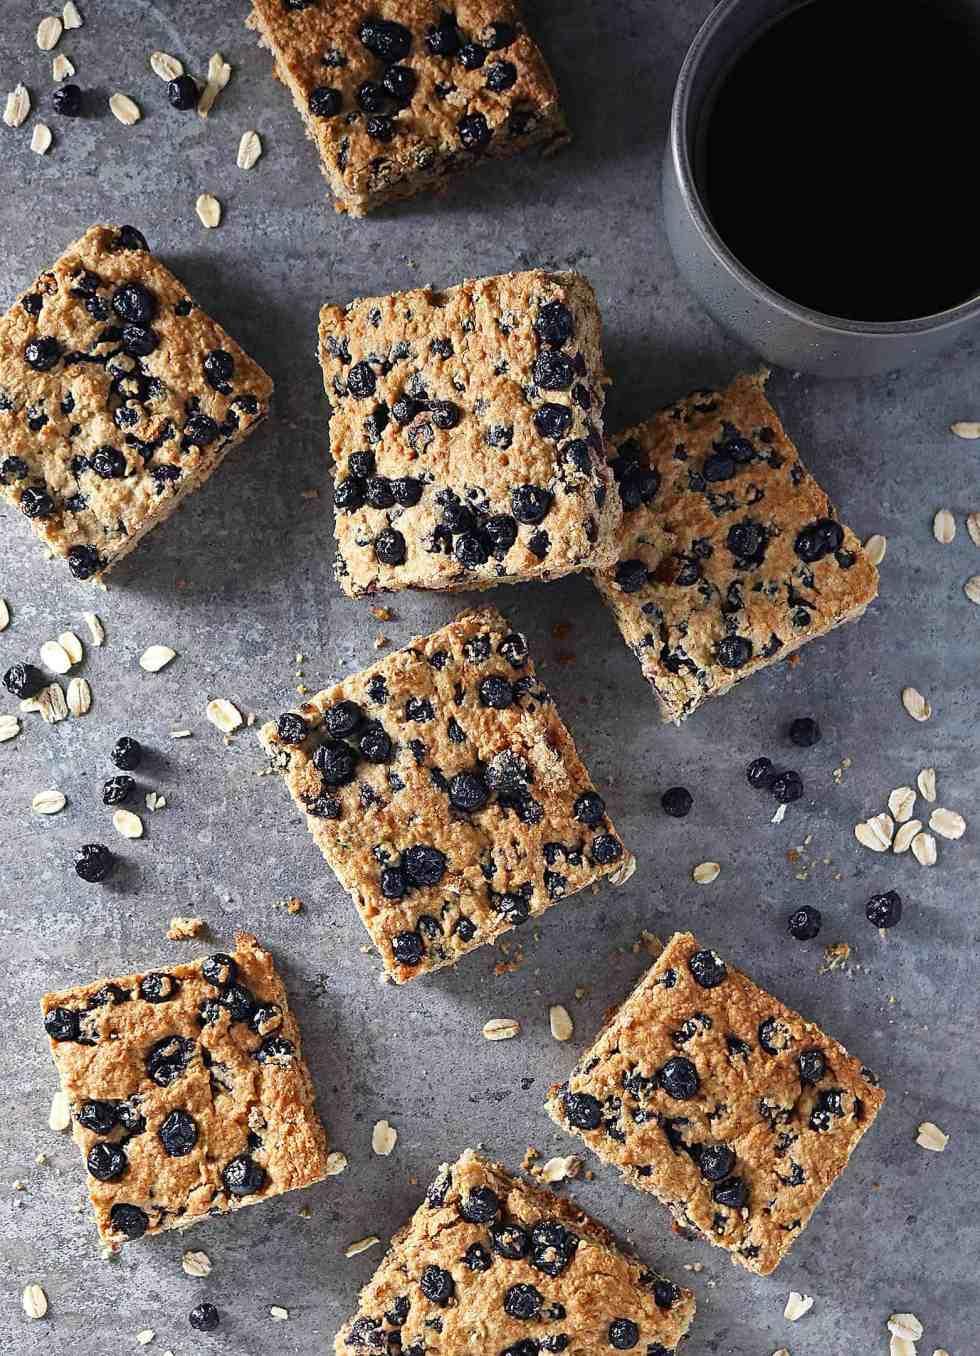 Easy Gluten Free Refined Sugar Free Blueberry Bars